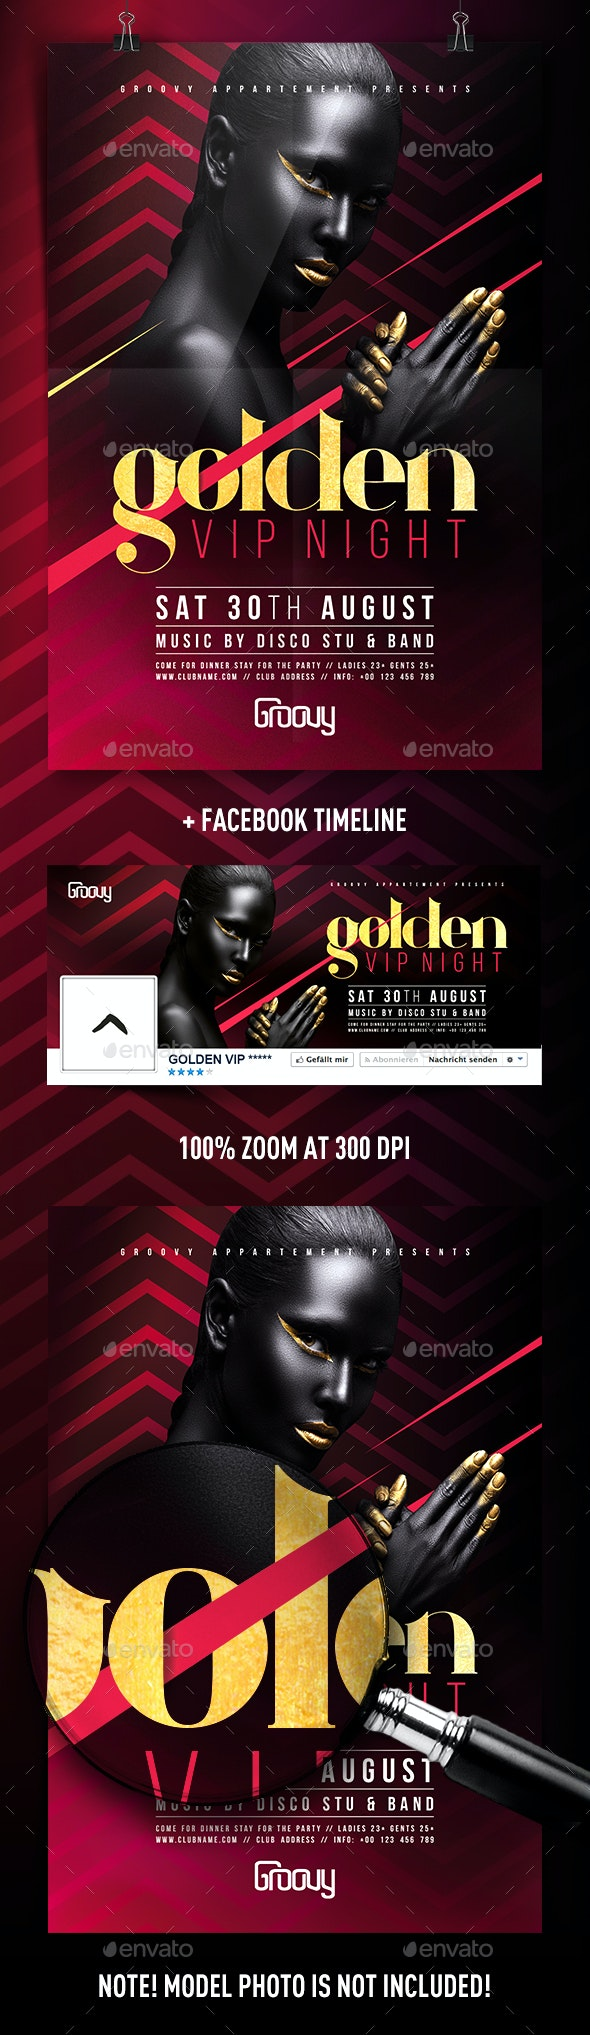 Golden VIP Night Flyer - Clubs & Parties Events